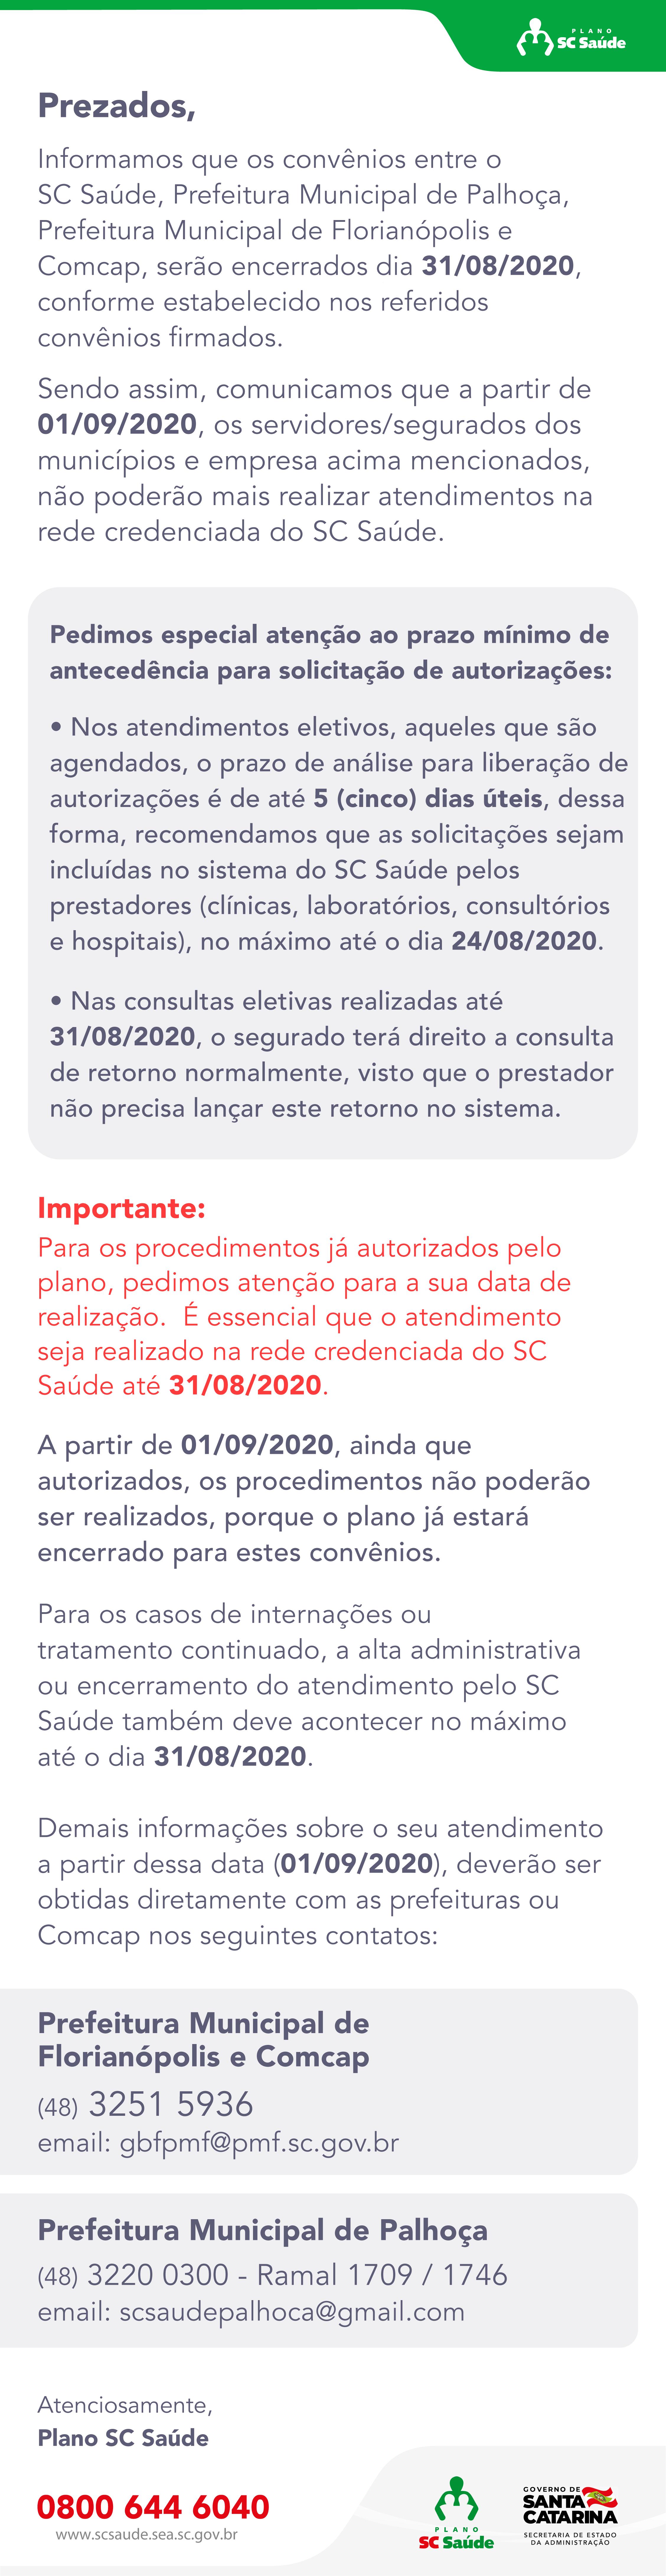 01/07/2020